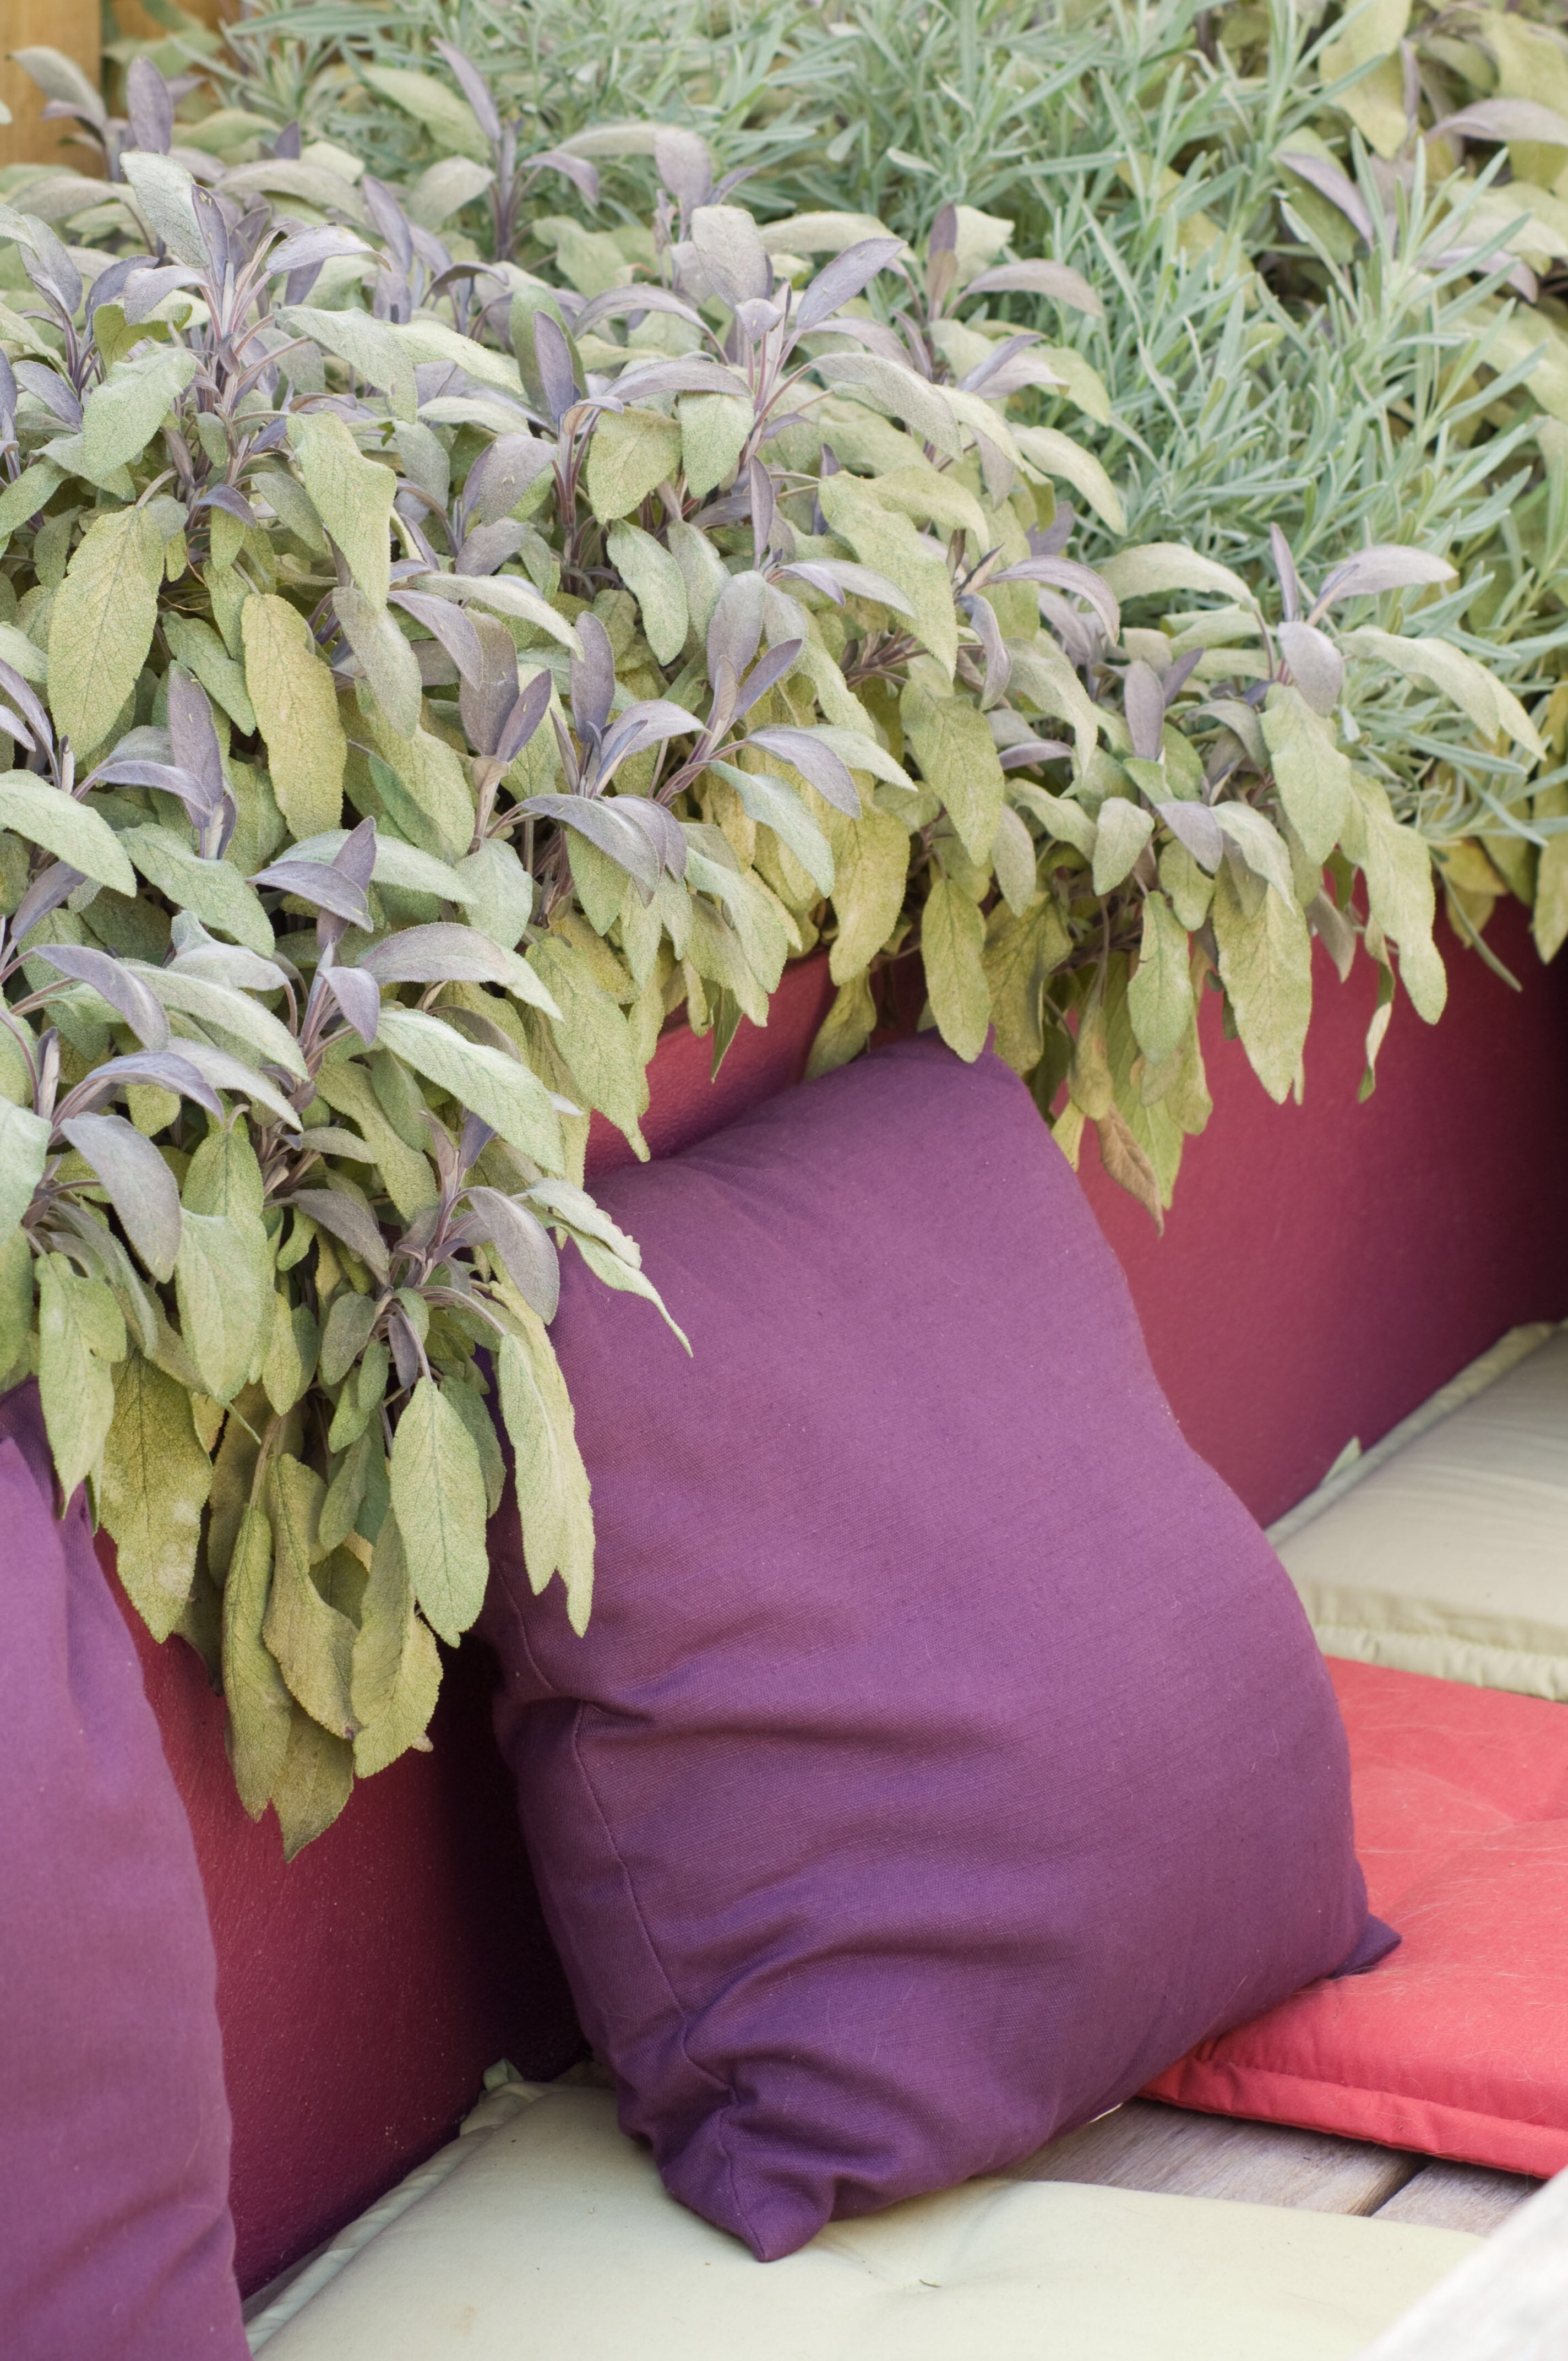 Rendered raised beds always look good in garden layout designs